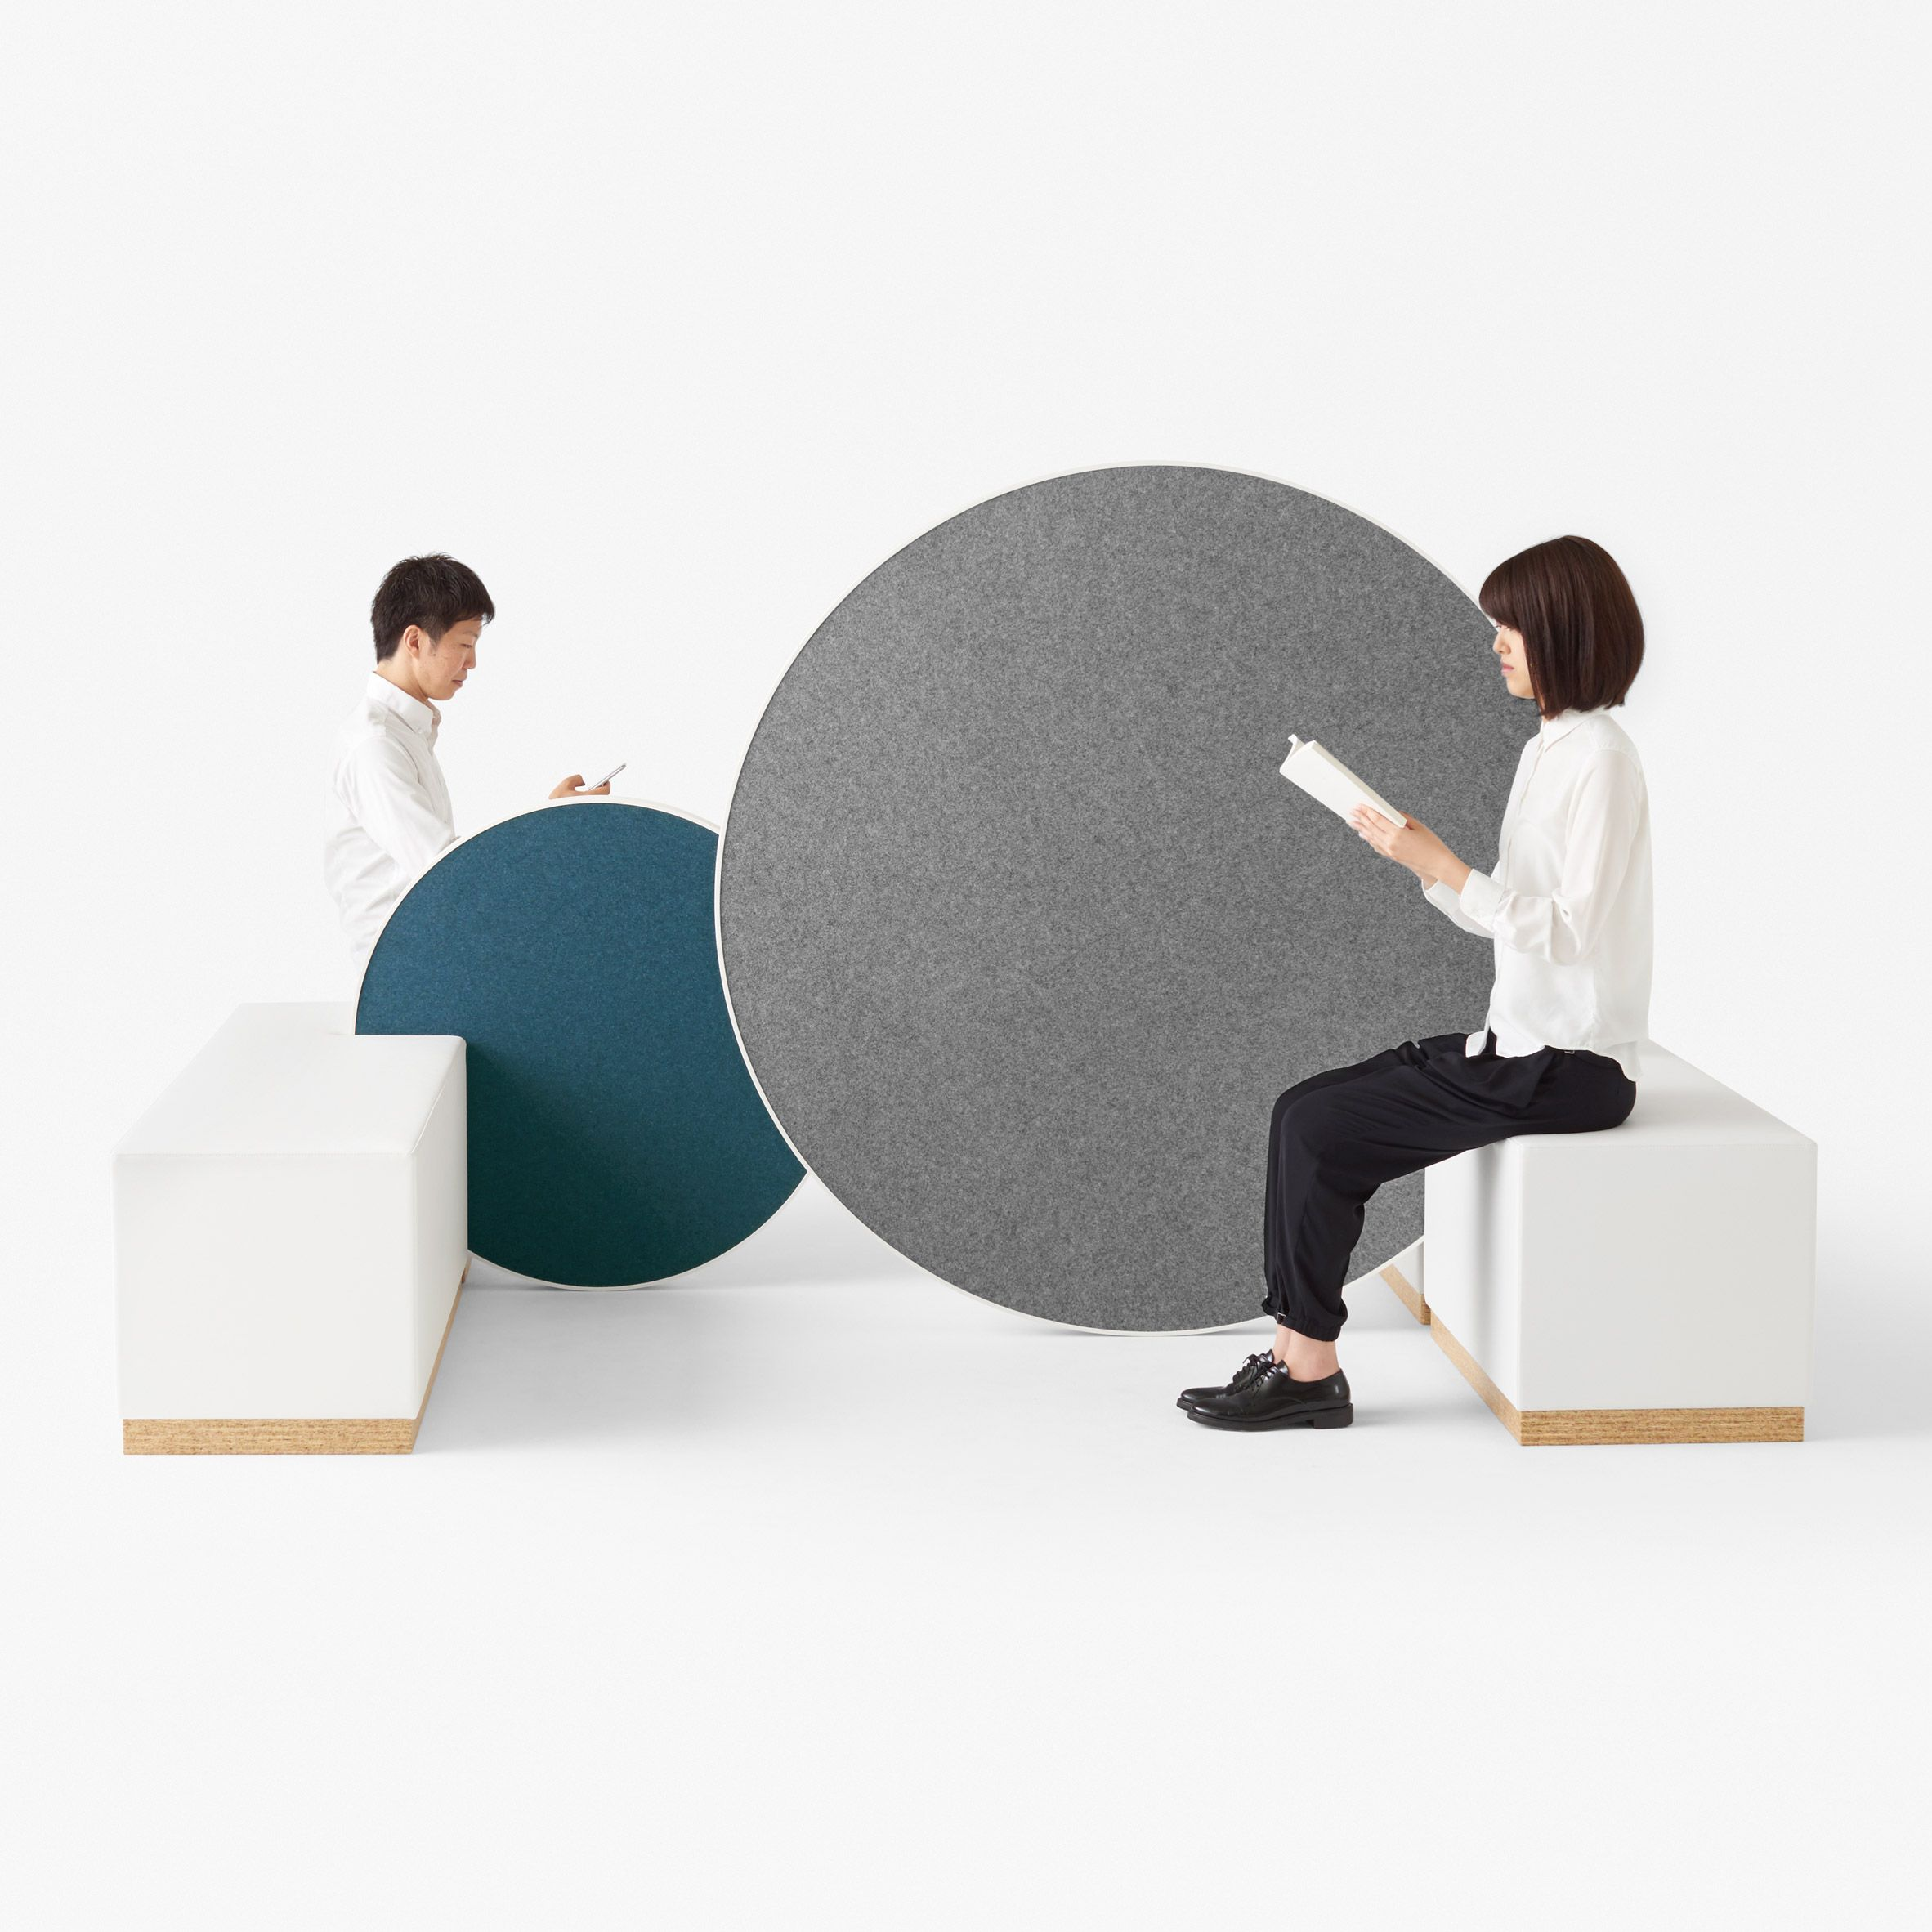 Japanese design studio Nendo has created an installation of circular ...